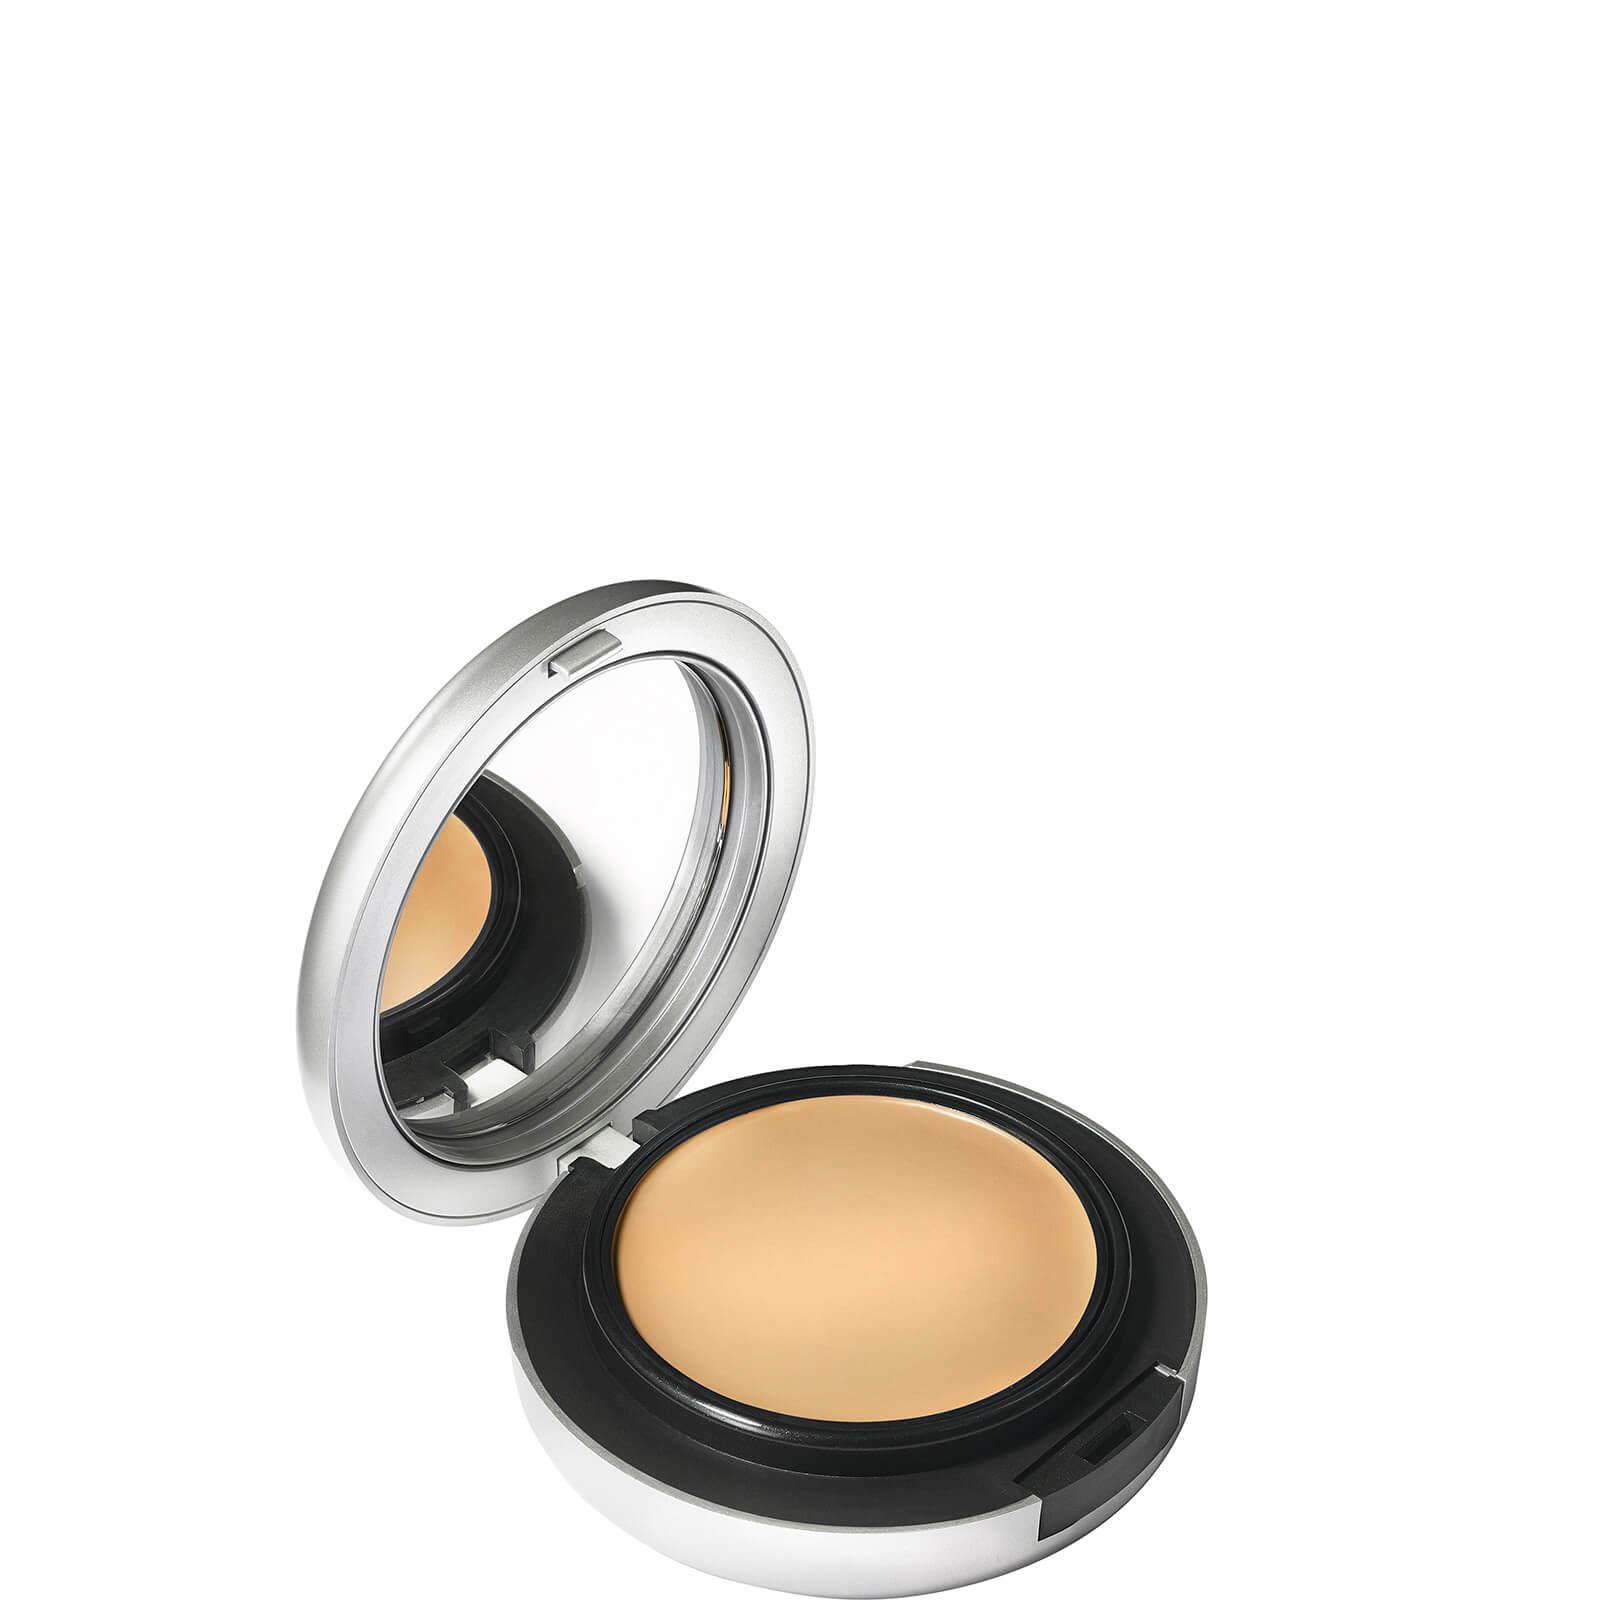 MAC Studio Fix Tech Cream-to-Powder Foundation 10g (Various Shades) - NC13